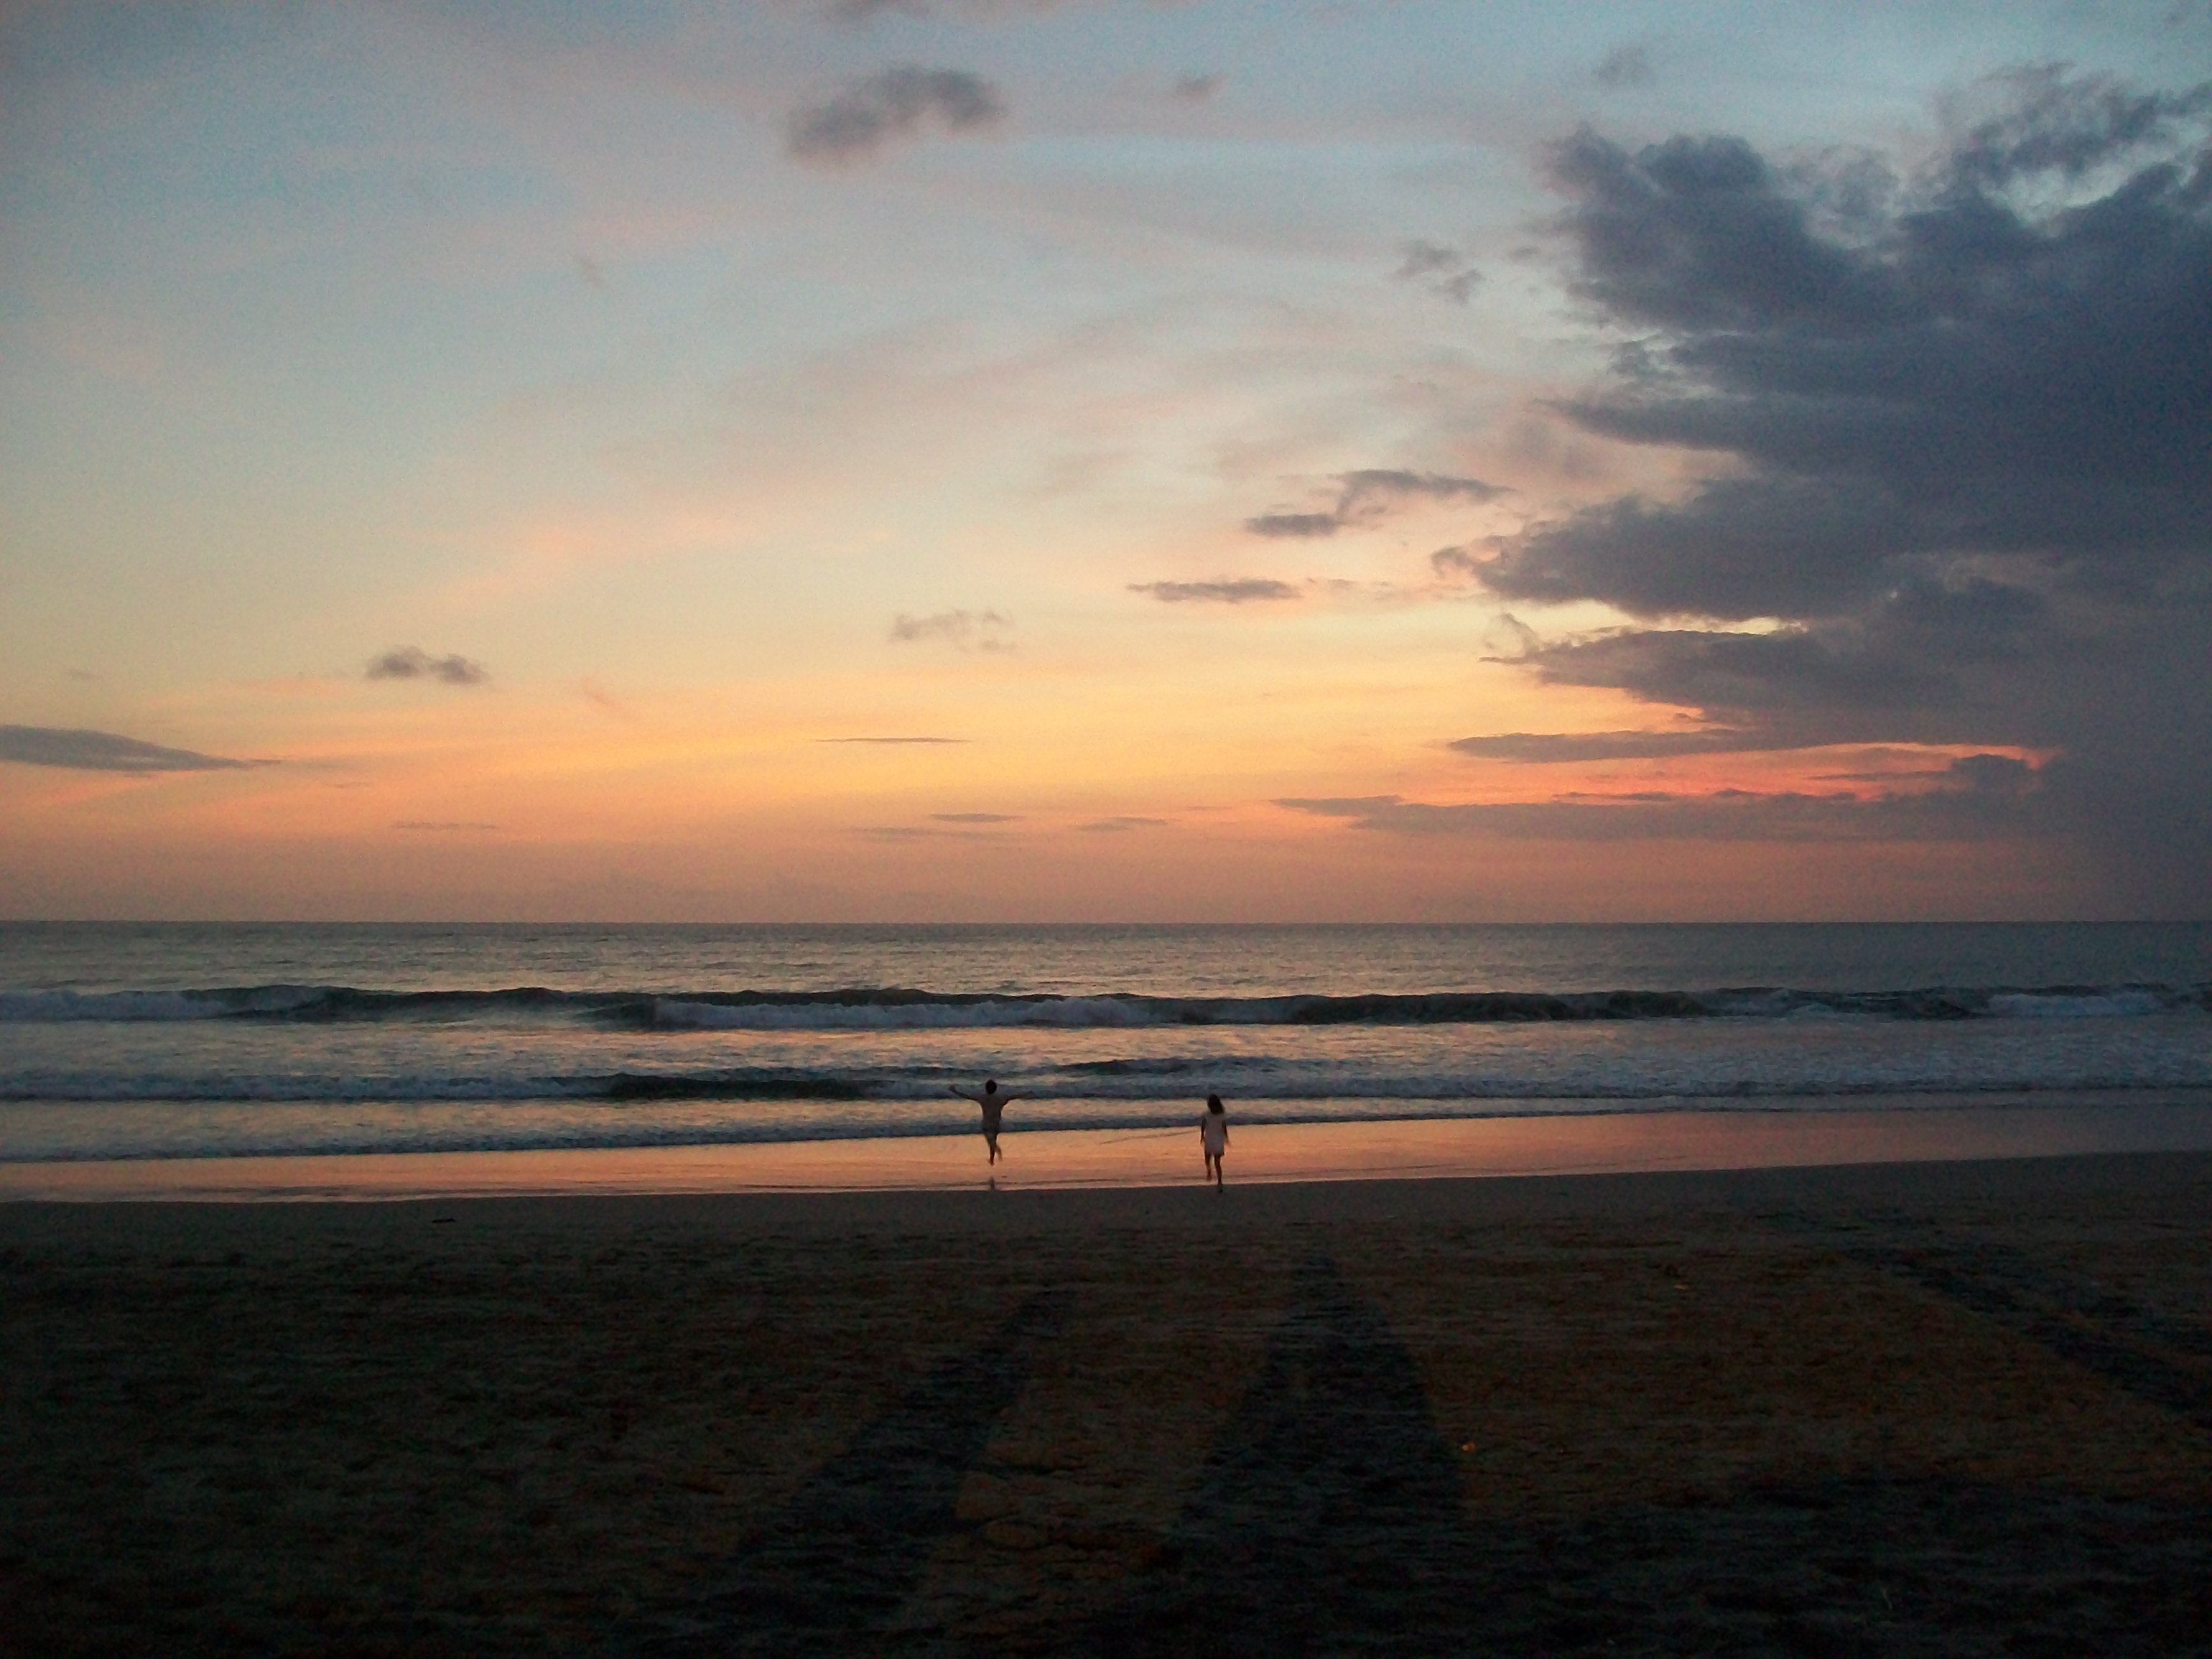 sunsets_(7).JPG